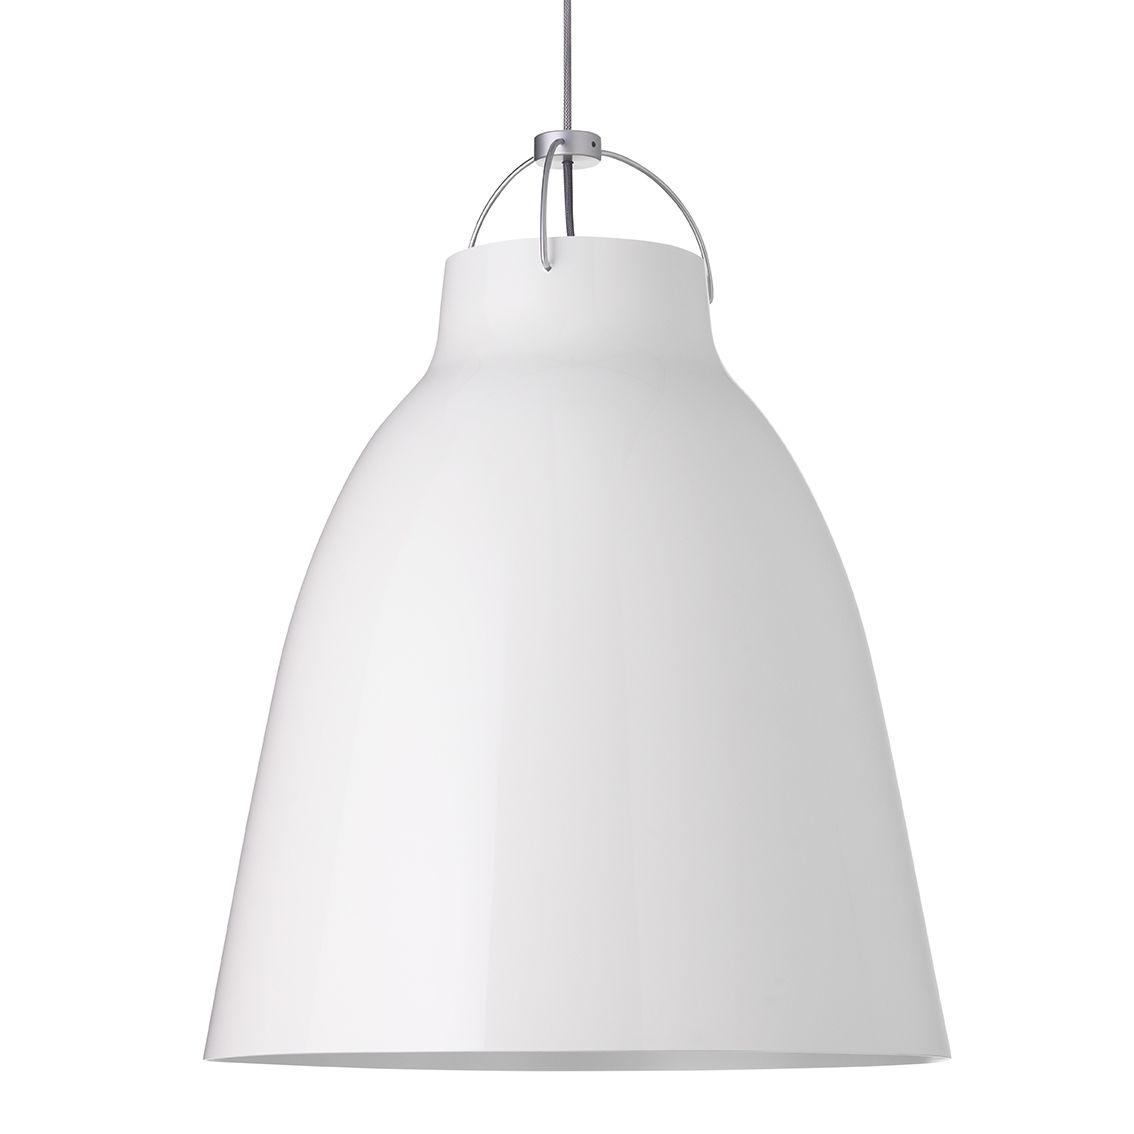 Caravaggio hanglamp Lightyears Ø55 hoogglans wit